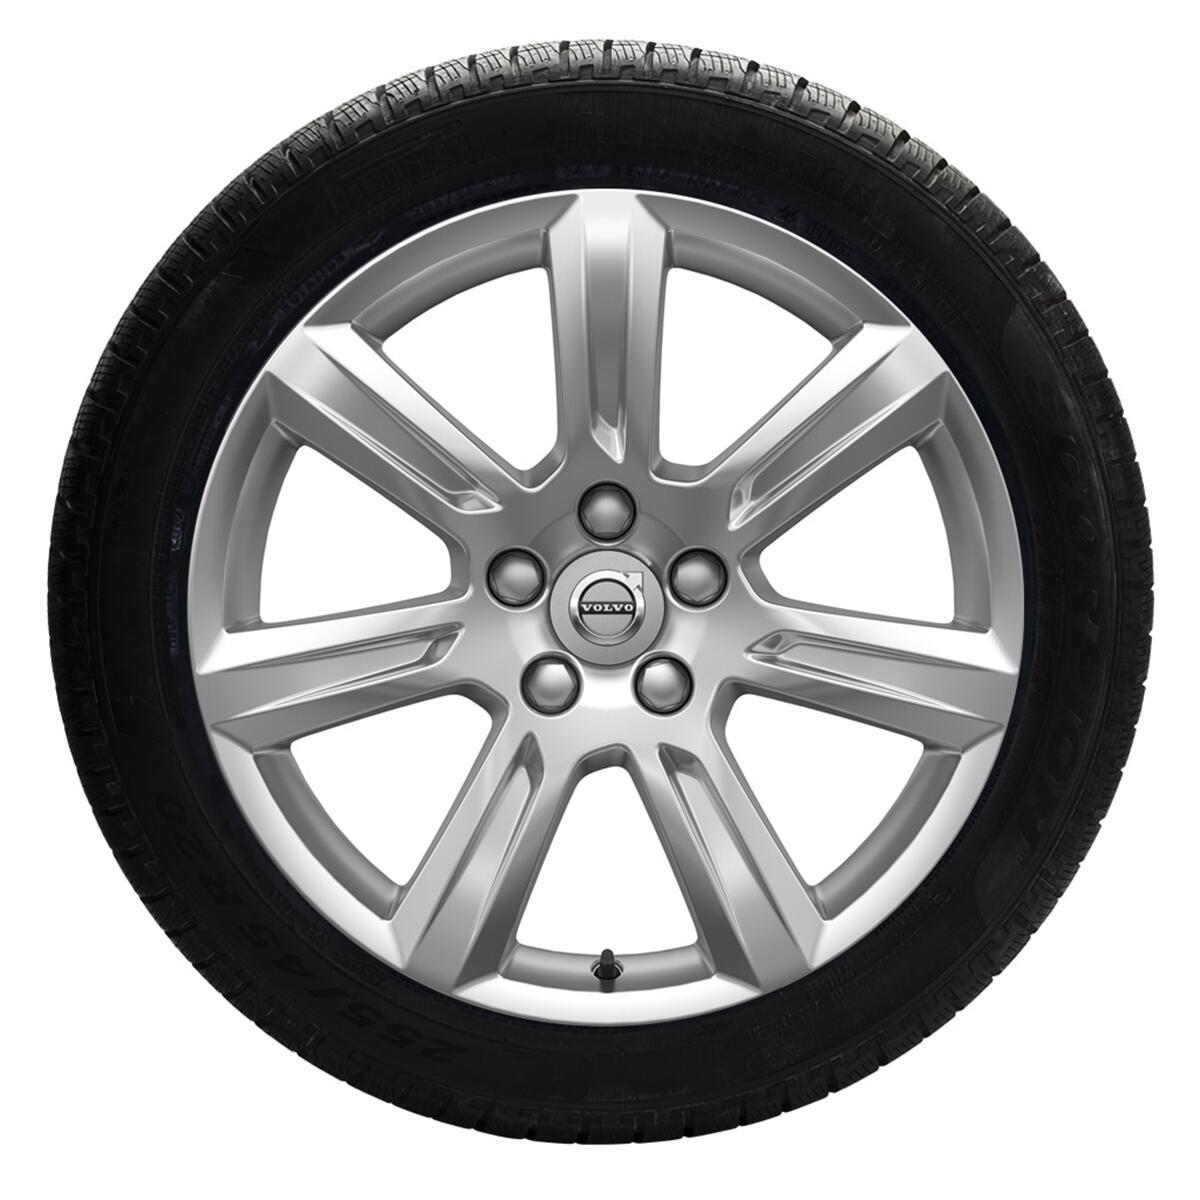 "Komplet zimskih koles: 43,18 cm (17""), pnevmatike Nokian"